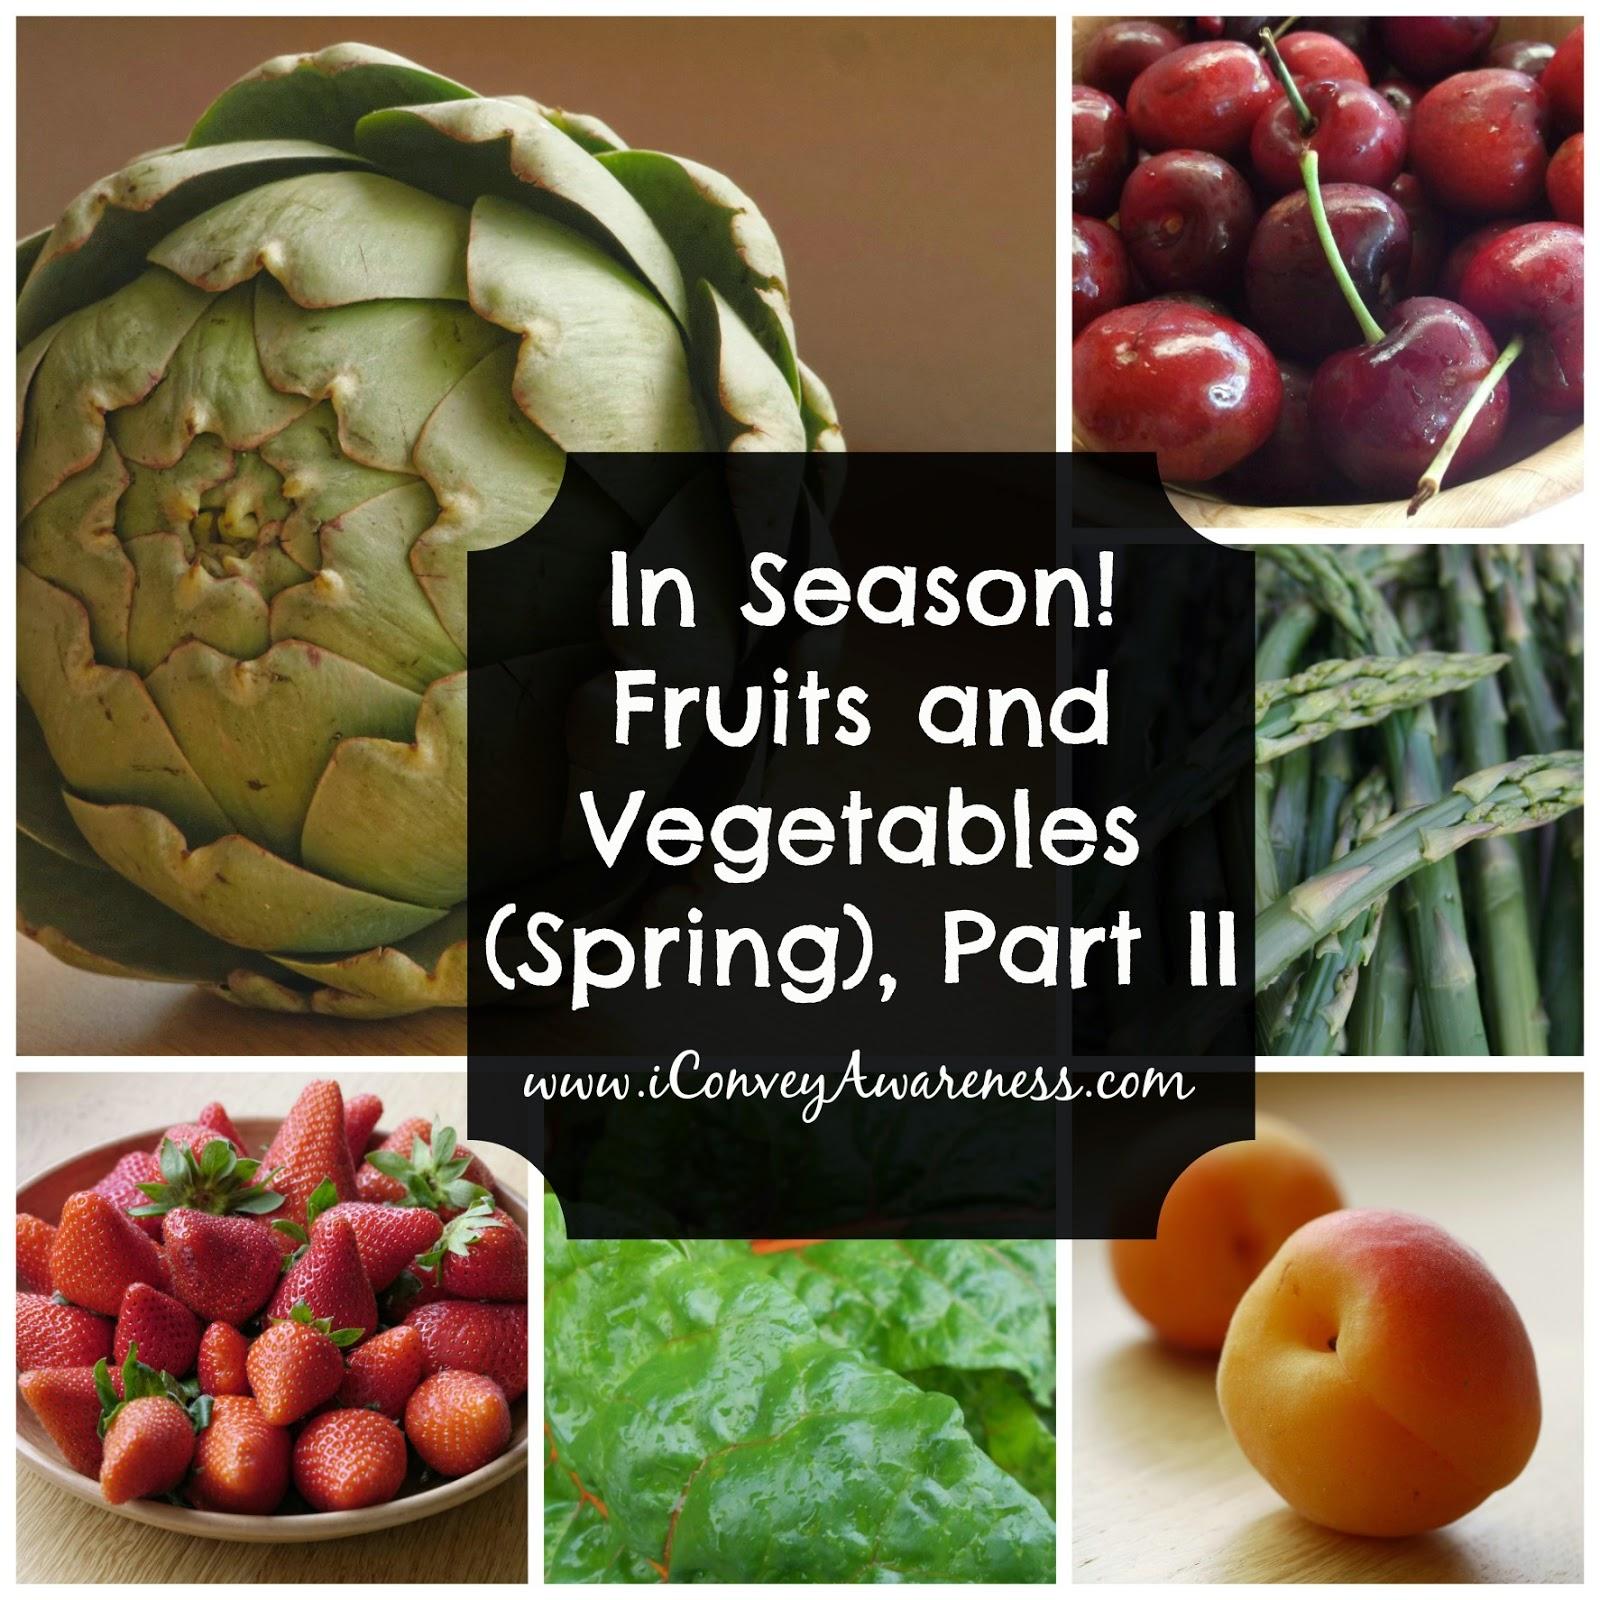 healthy veggies and fruits fruits in season